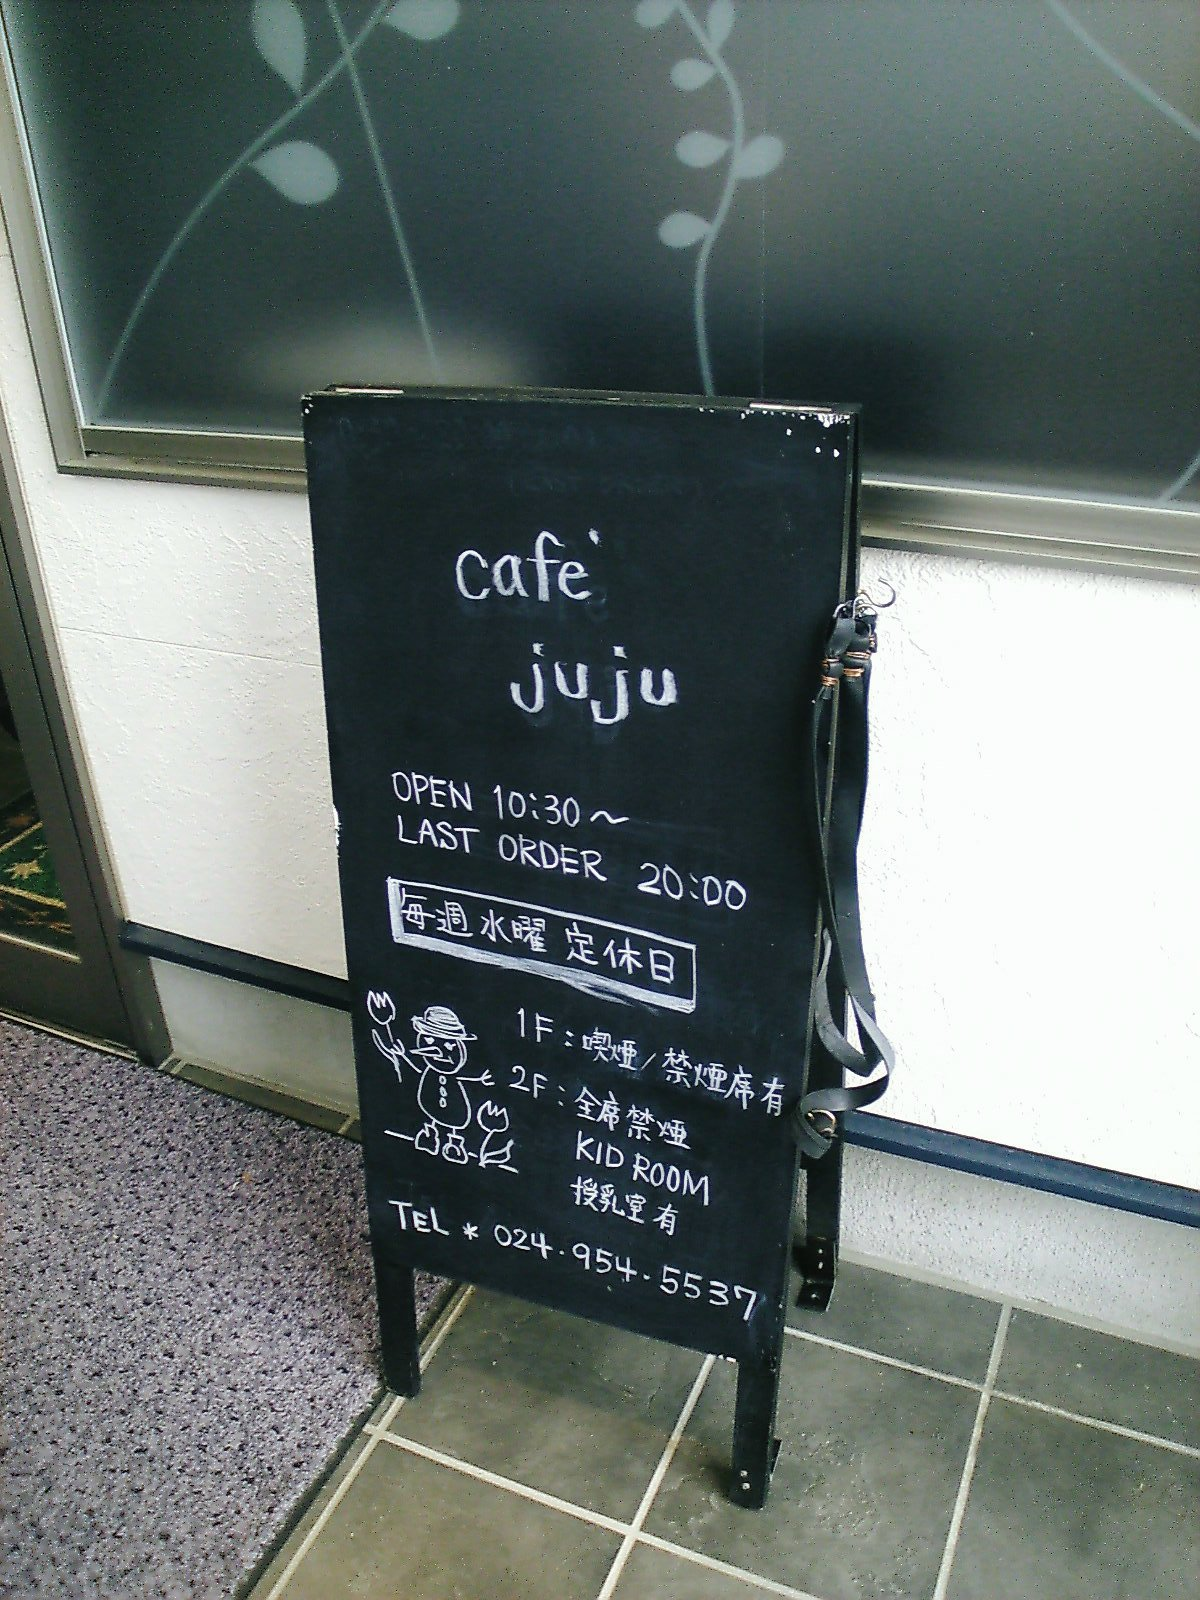 cafe juju